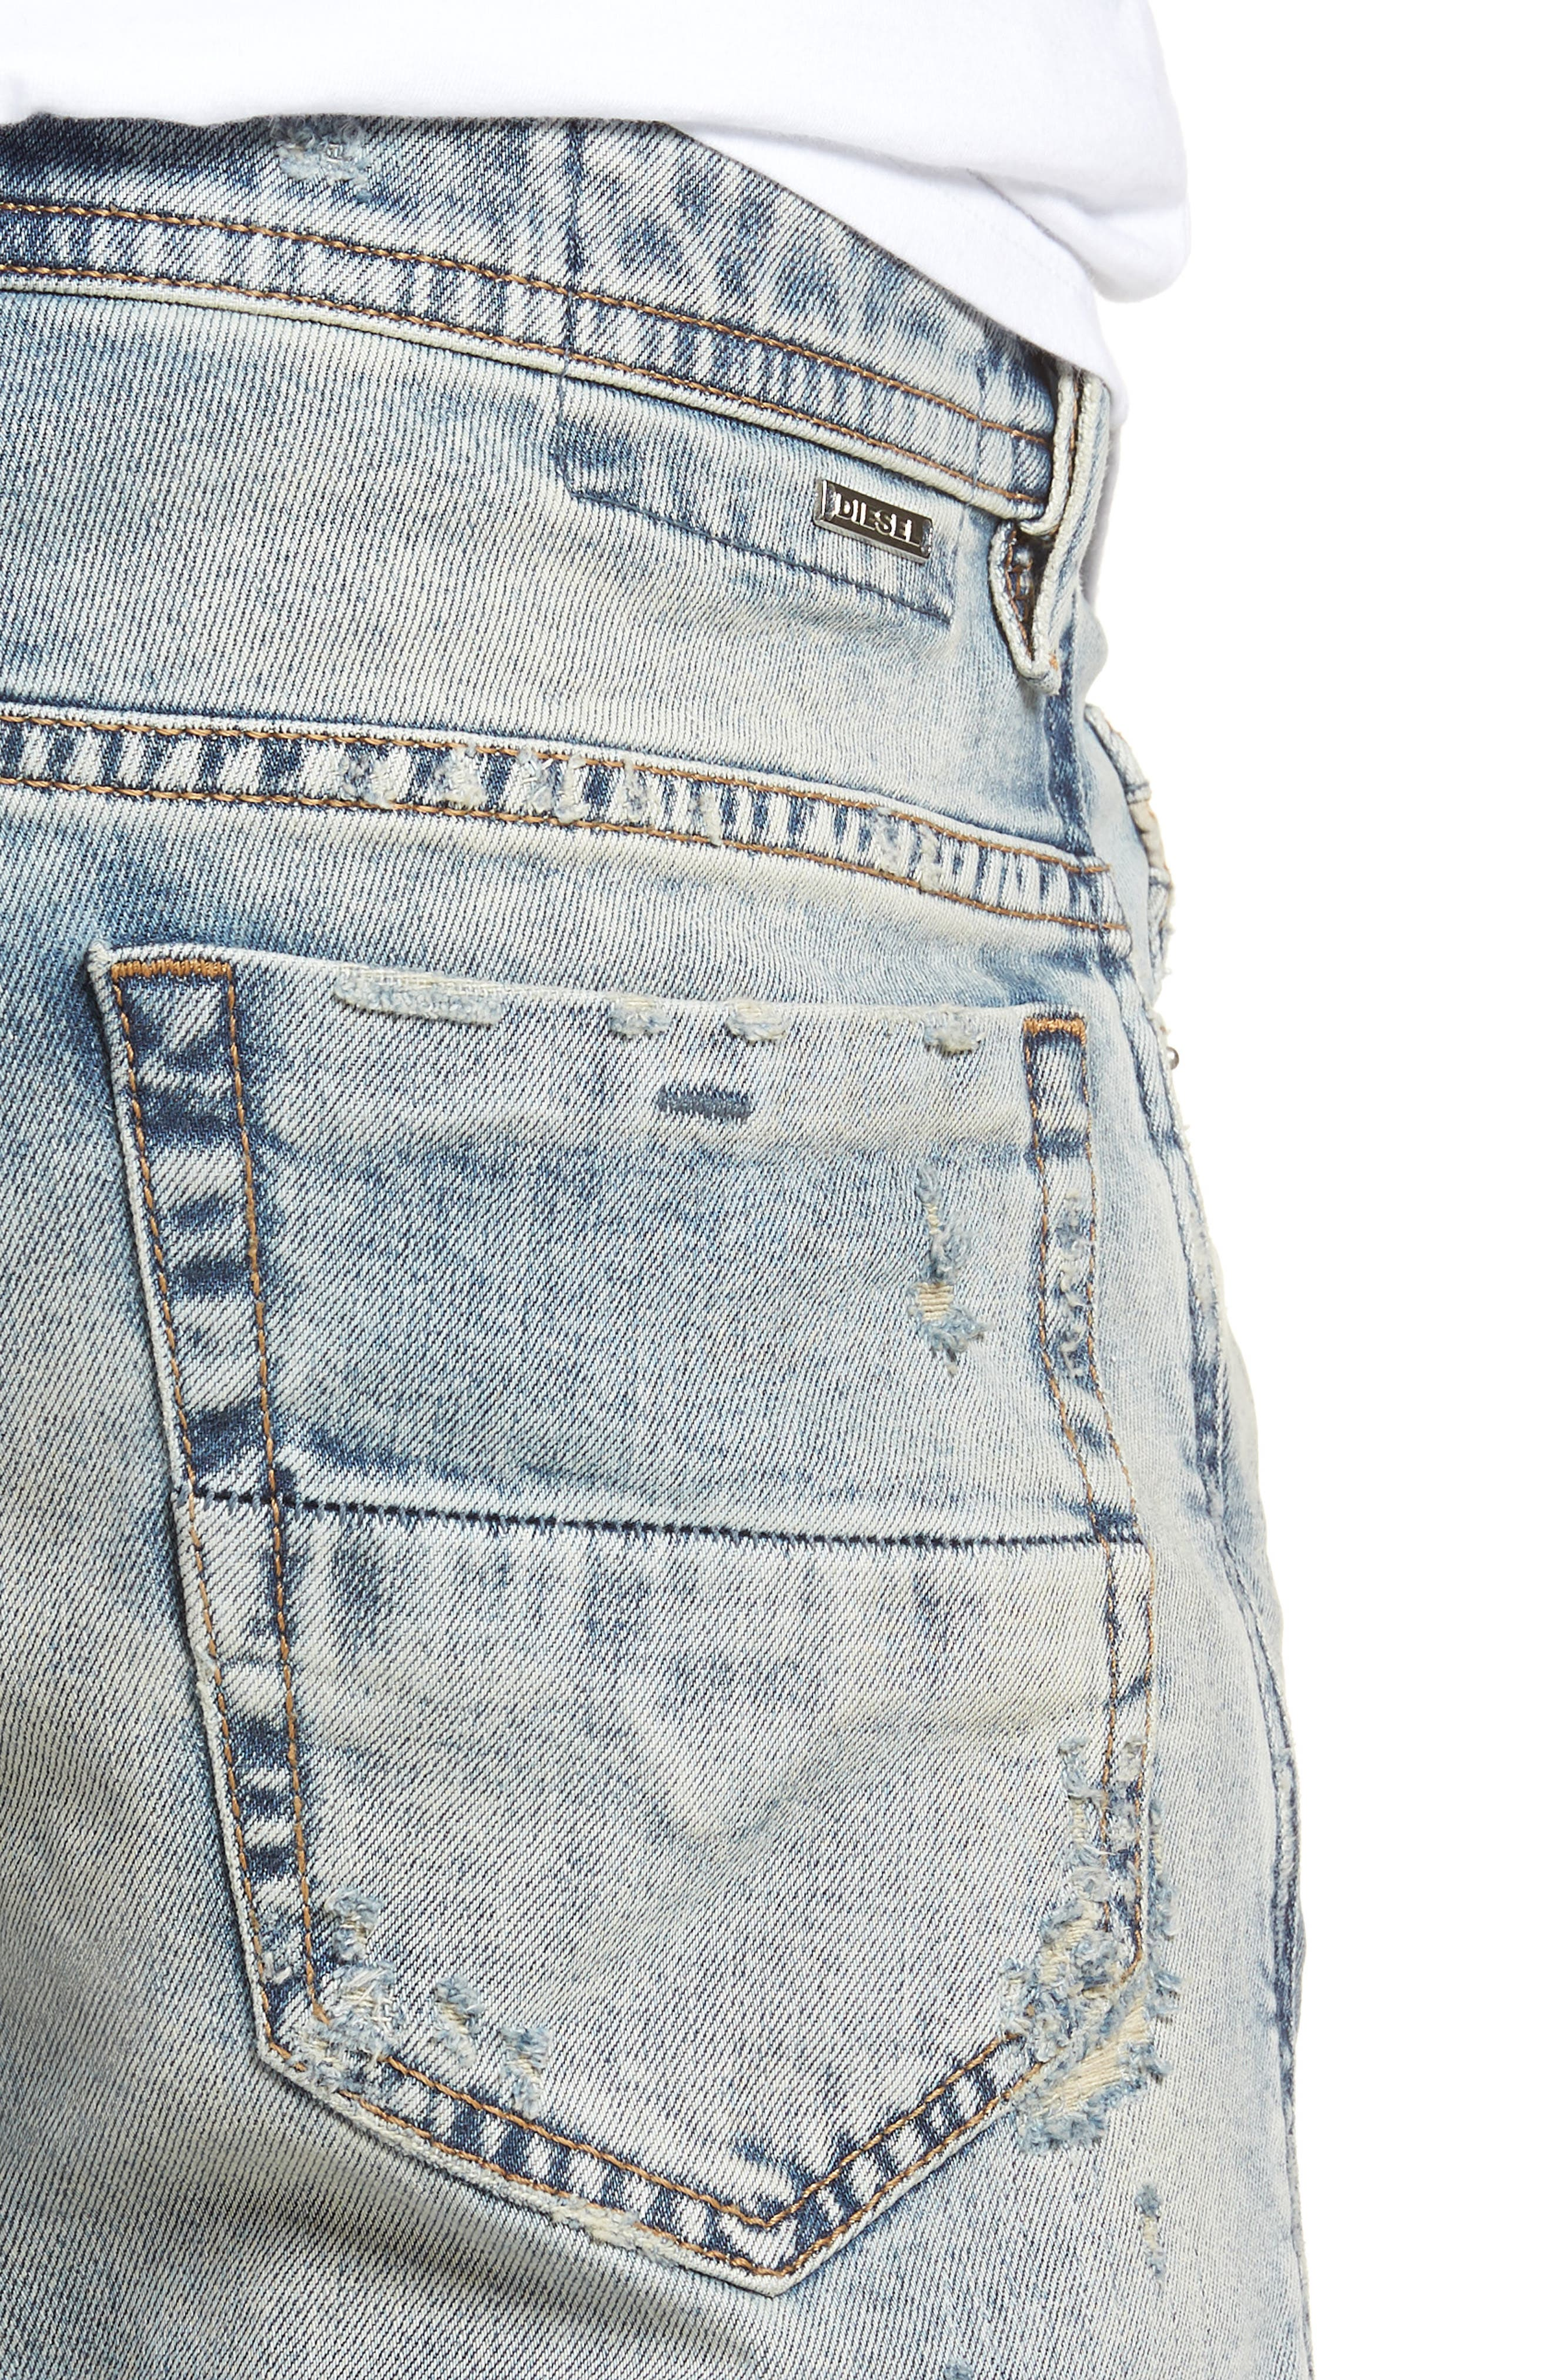 Thommer Skinny Fit Jeans,                             Alternate thumbnail 4, color,                             084Rf